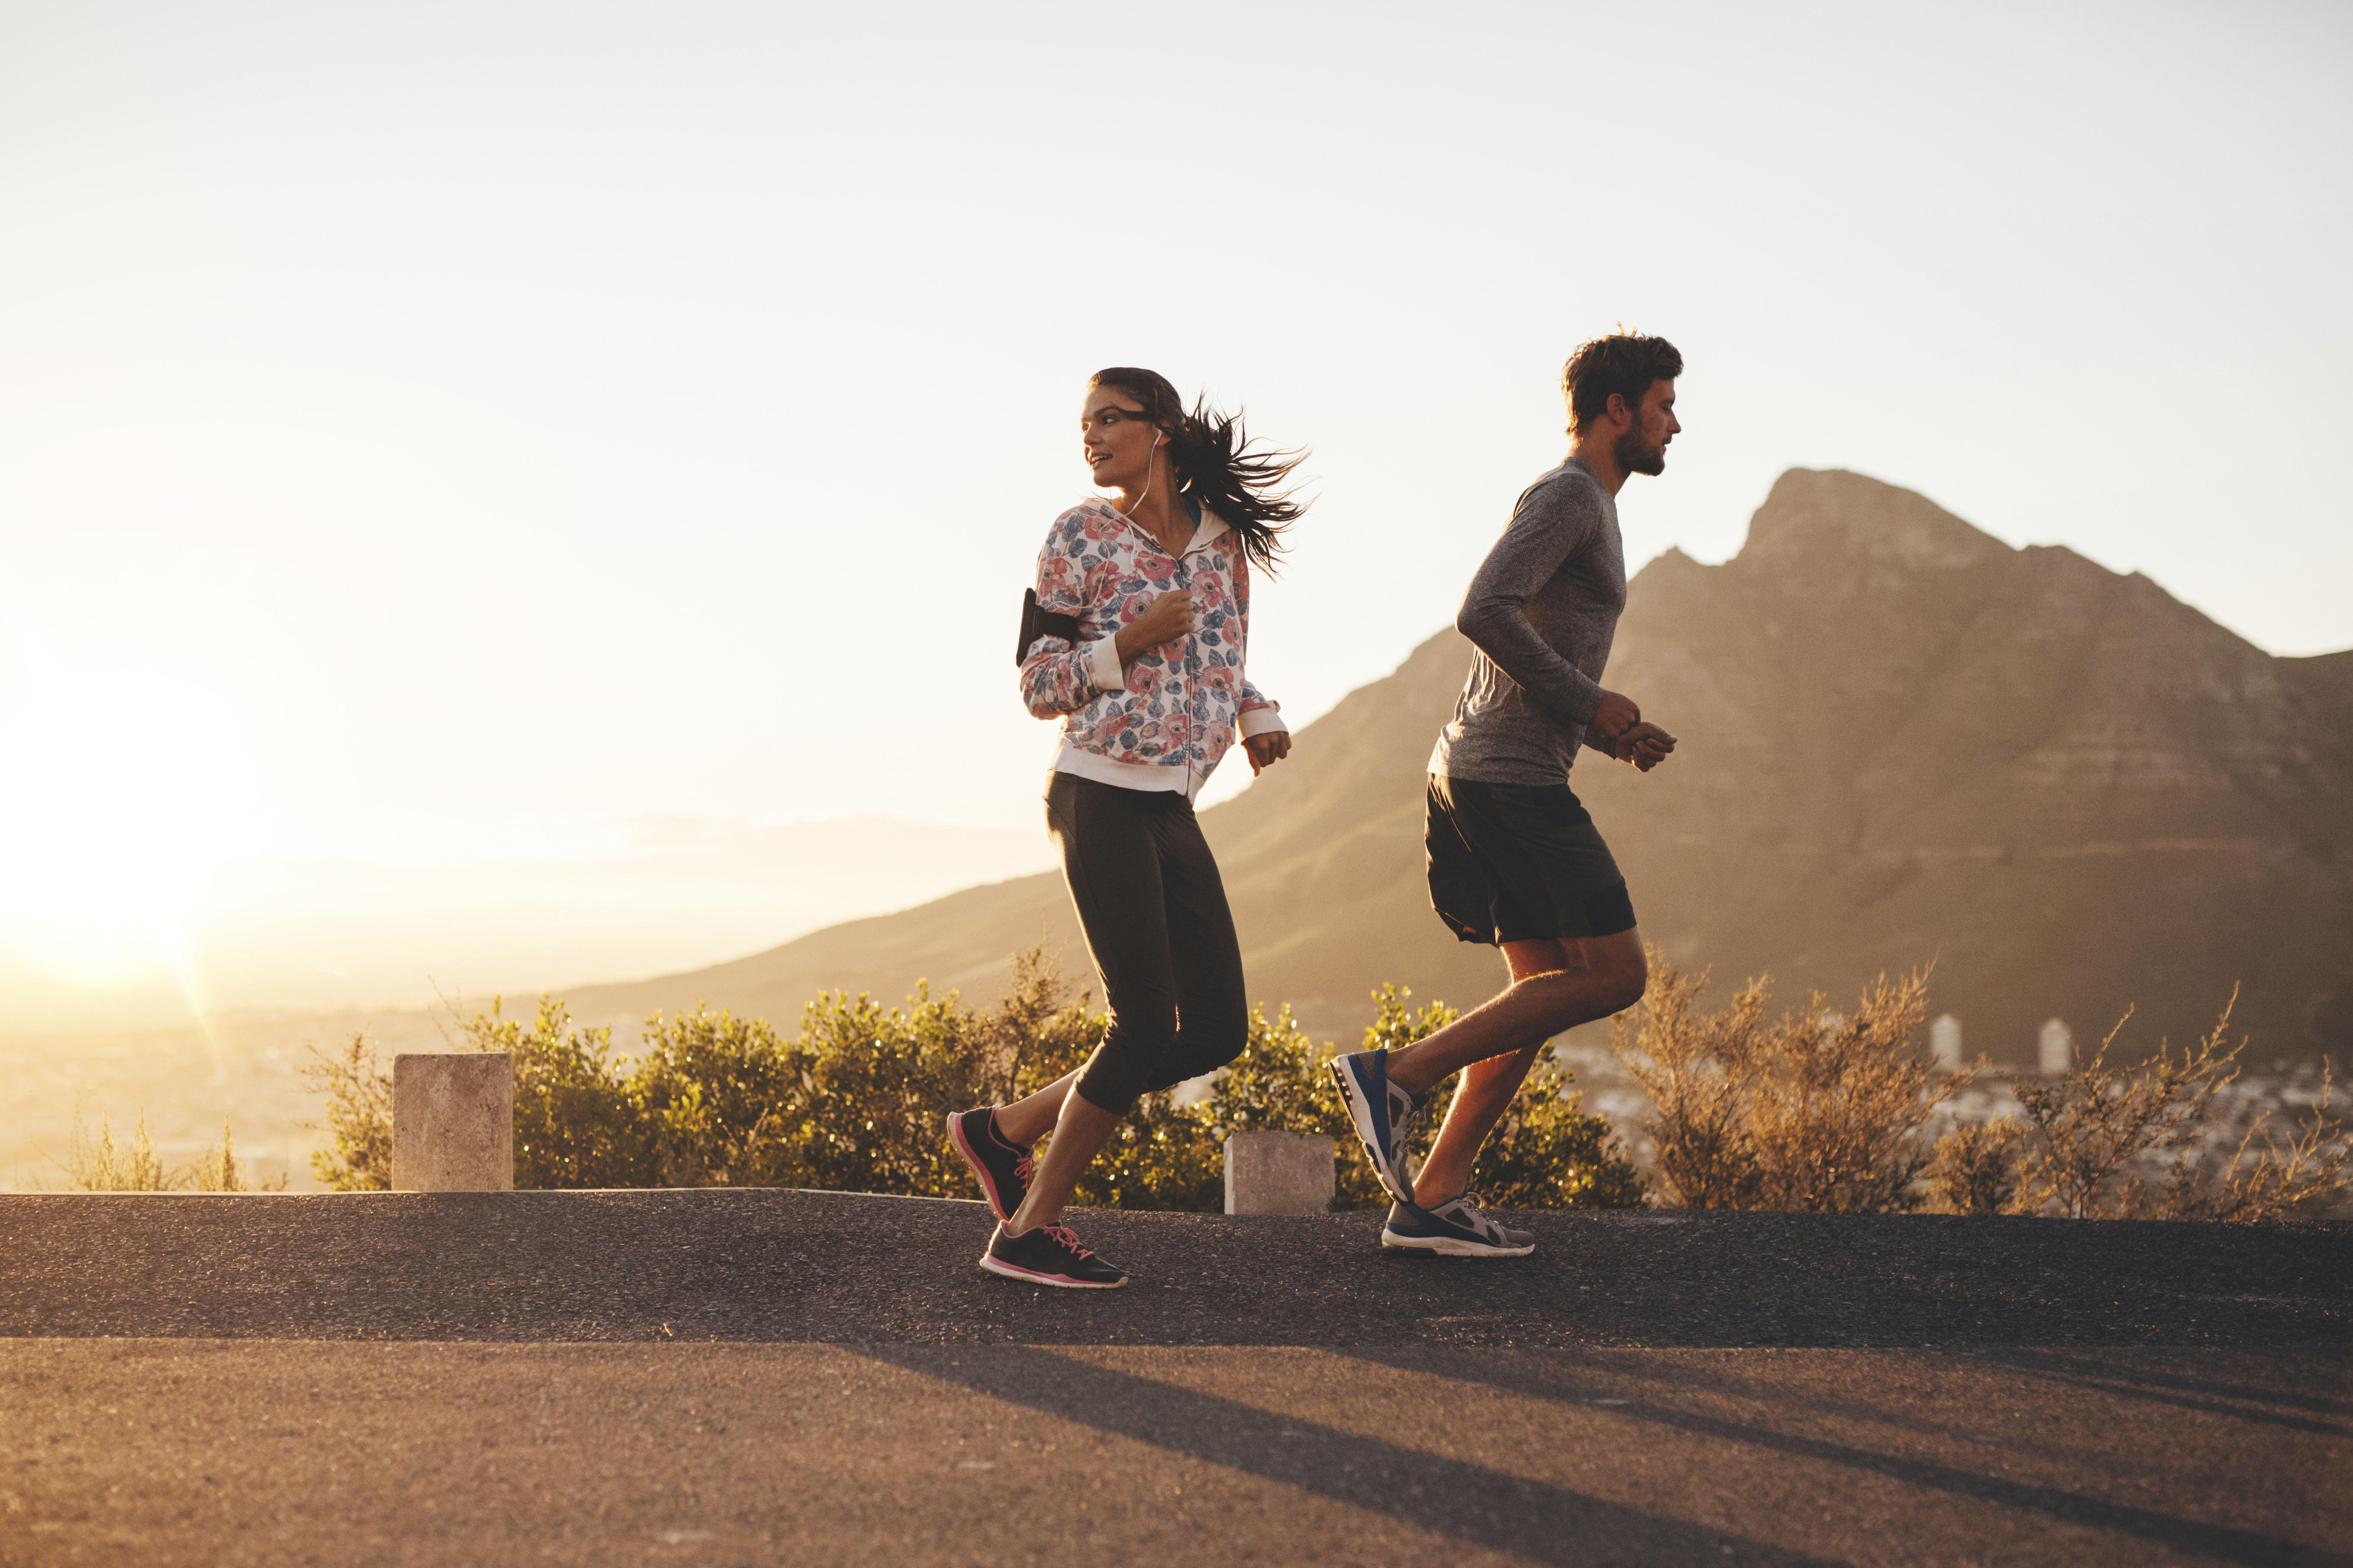 Your first marathon race